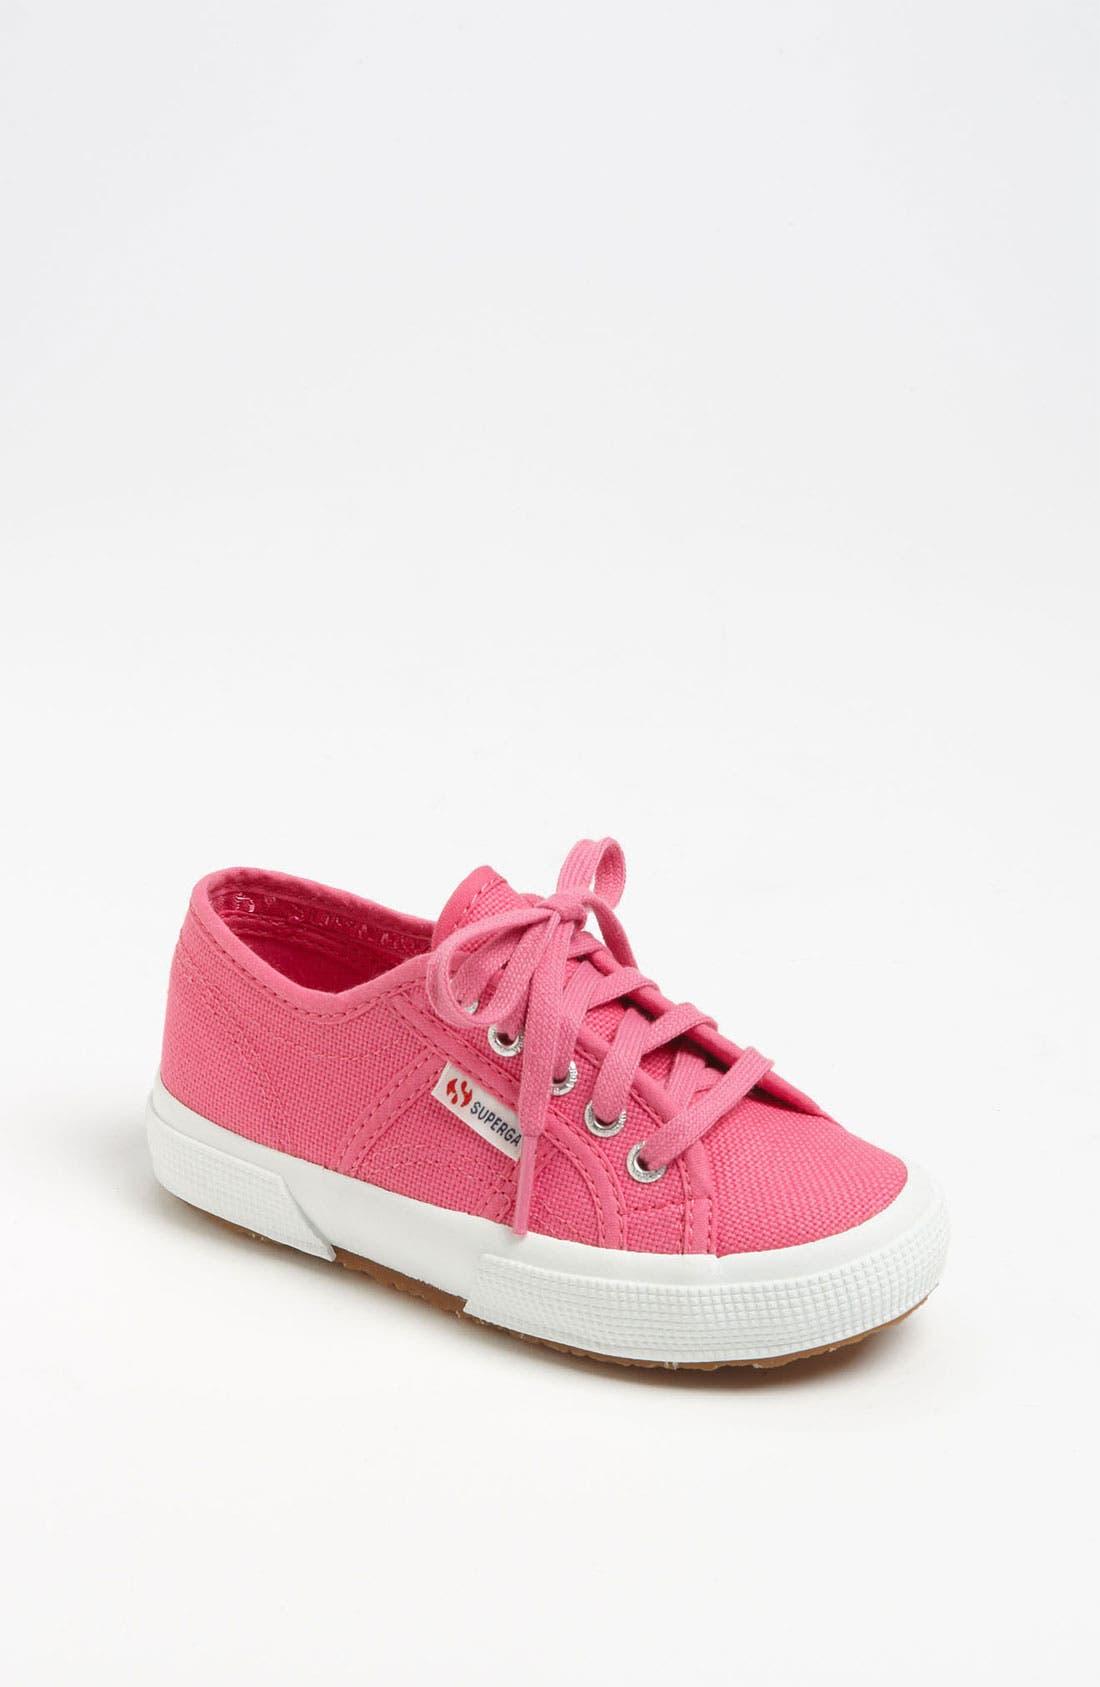 Main Image - Superga 'Junior Classic' Sneaker (Walker, Toddler & Little Kid)